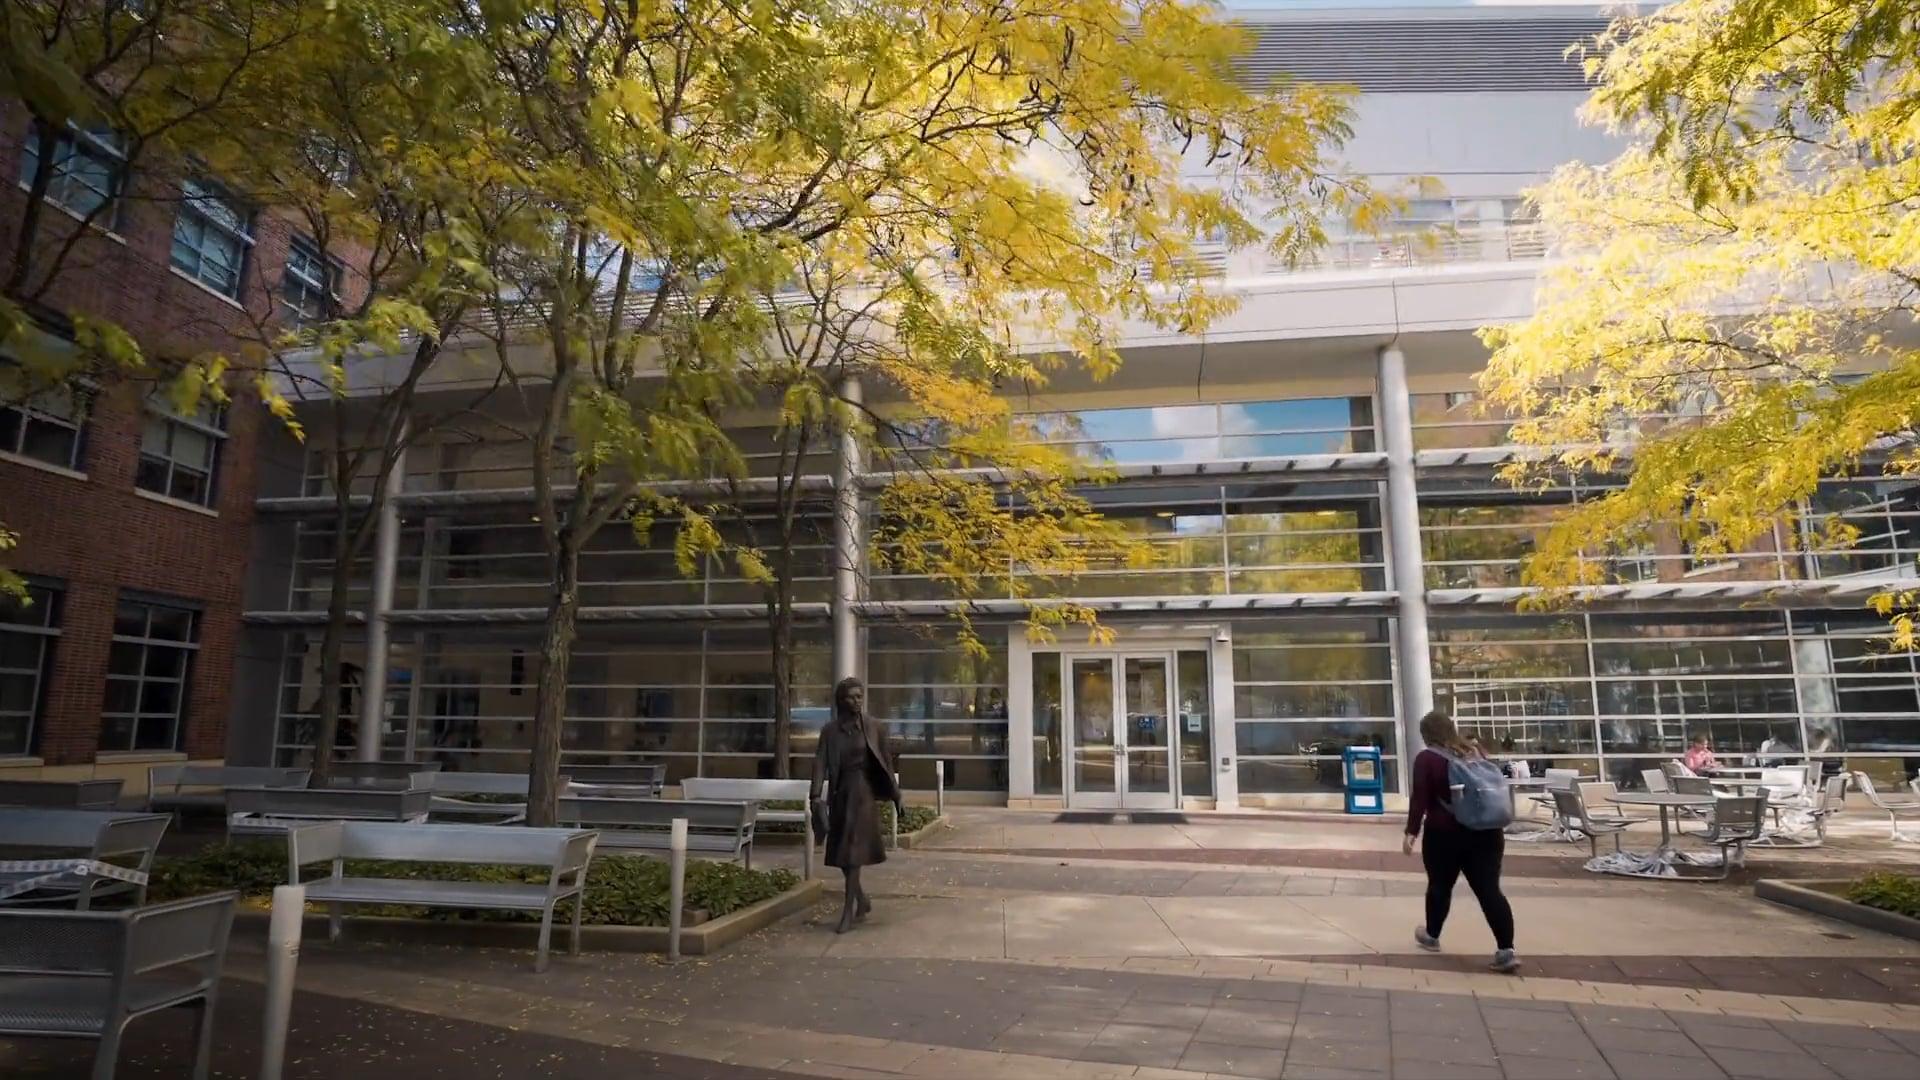 Preparing Business Leaders To Thrive - Penn State Smeal Professional Graduate Program